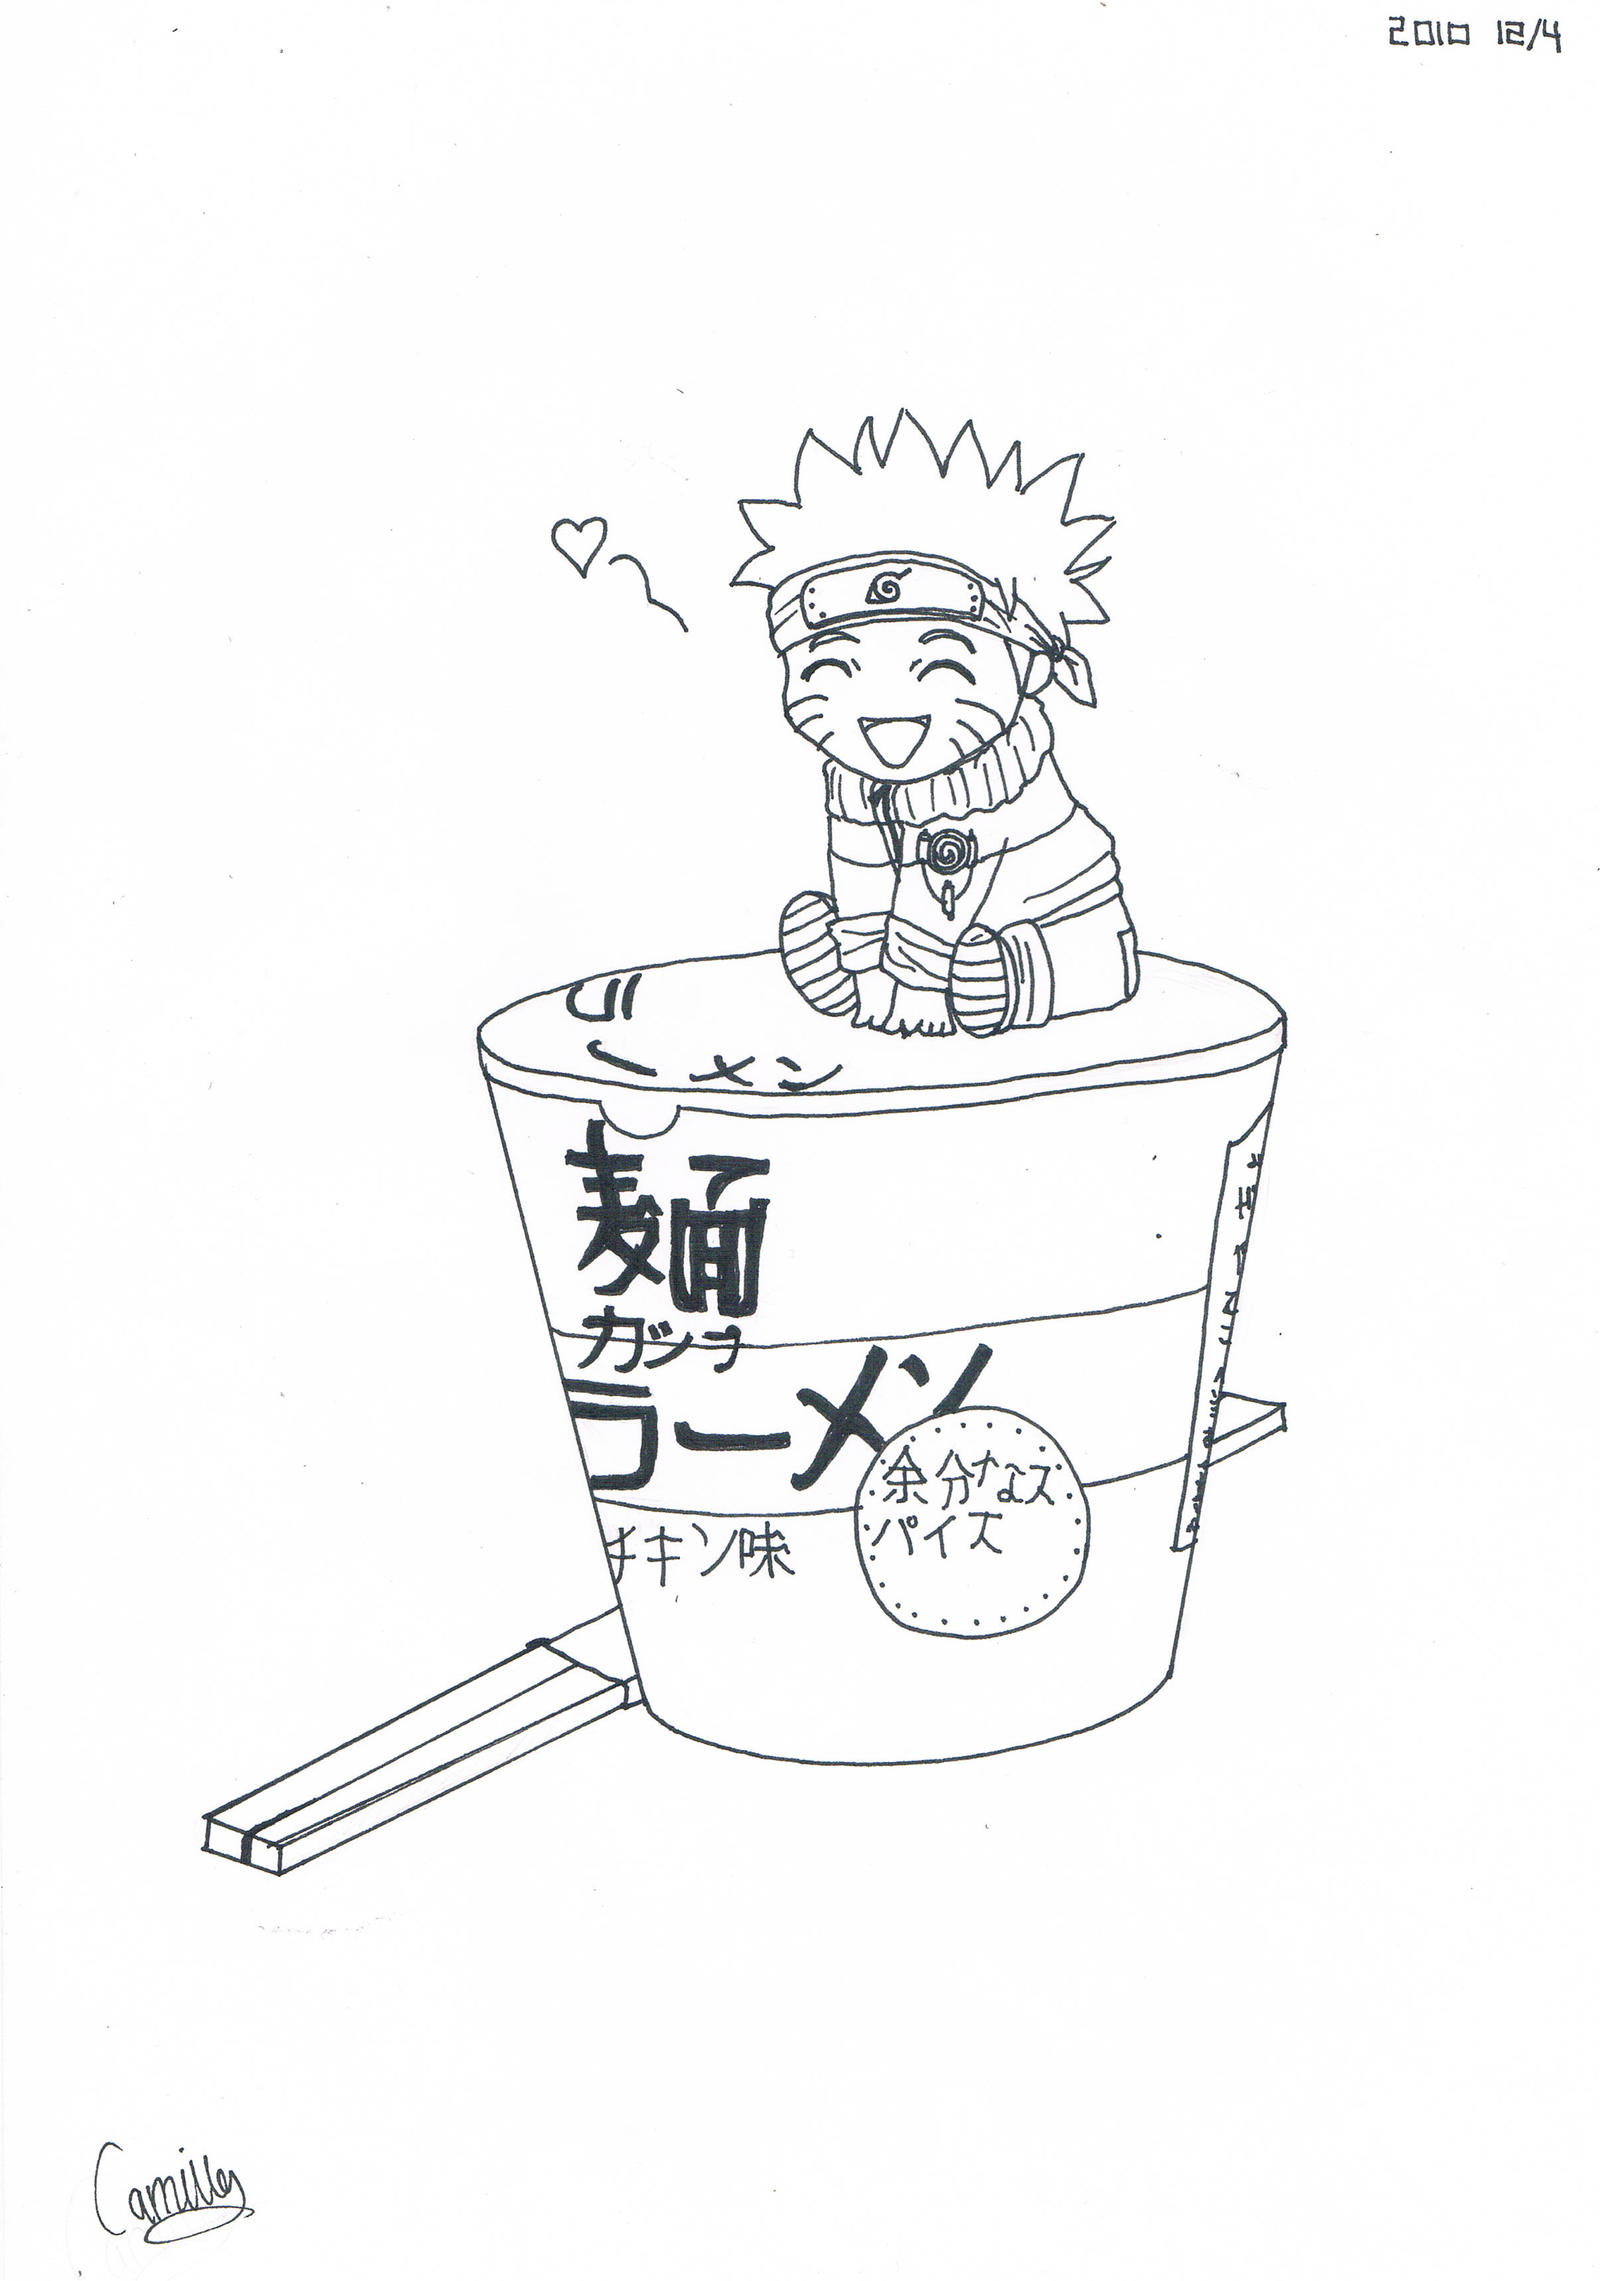 Cute naruto chibi by lrakuenl on deviantart - Naruto chibi images ...